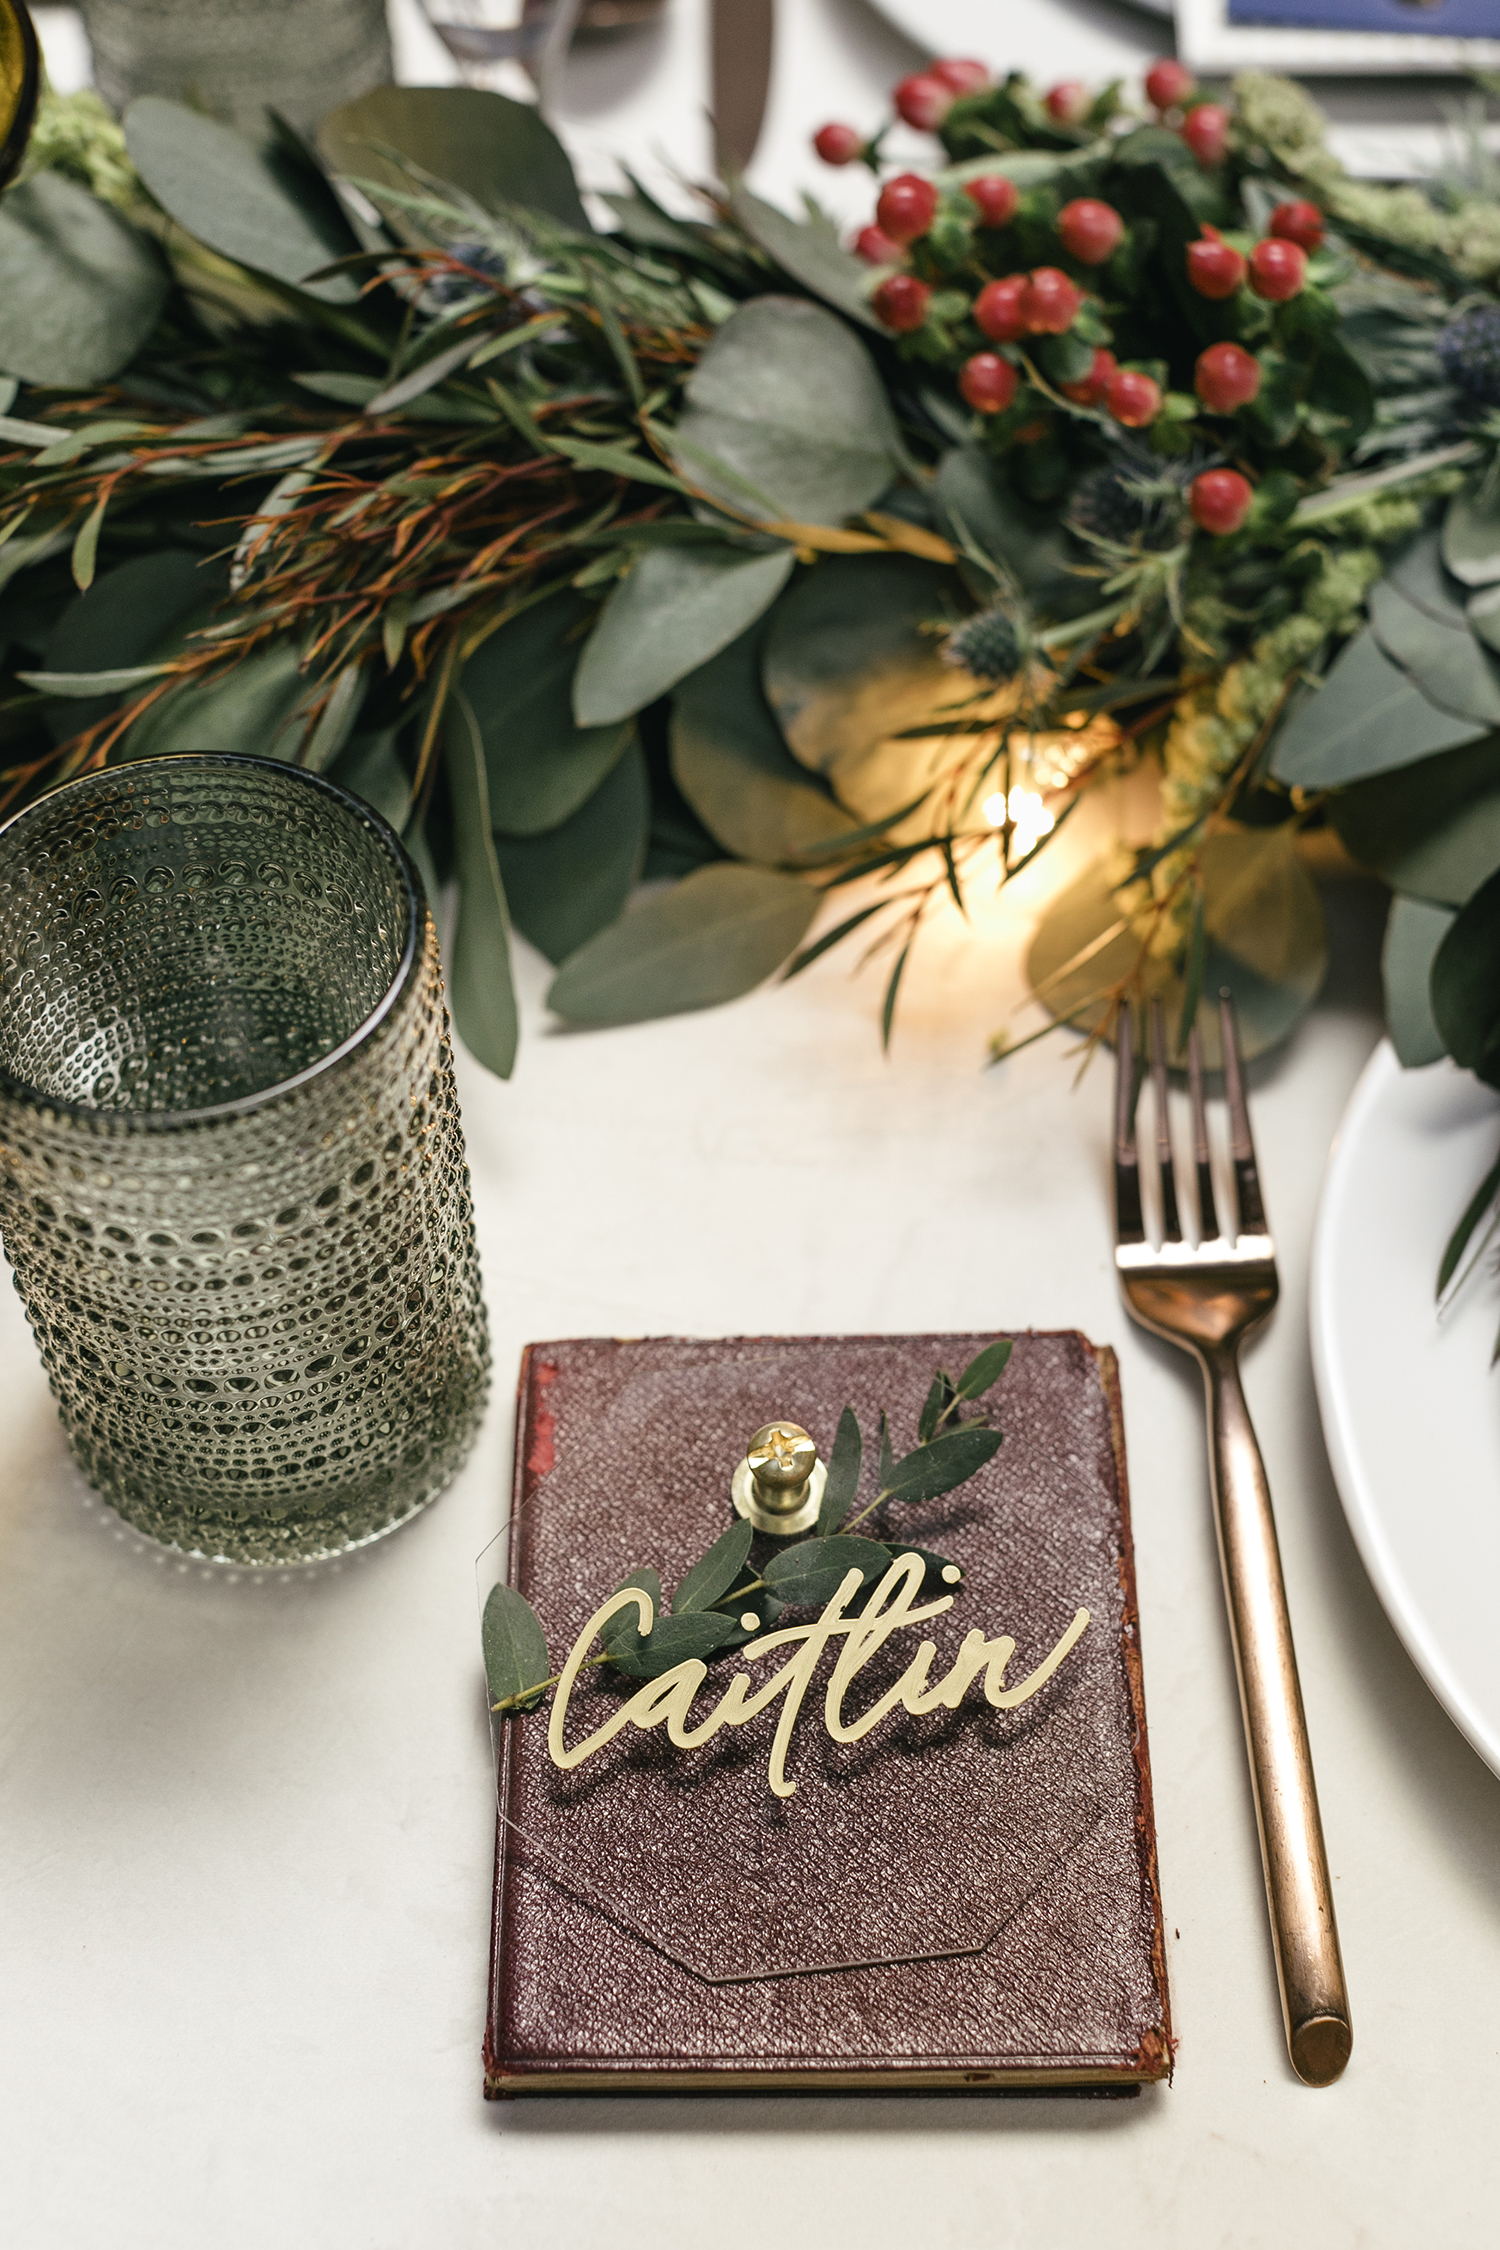 photography-wedding-weddings-natural-candid-pafa-pennsylvania academy-philadephia-philly-philadelphia wedding-mixed race-editorial-modern-fine-art-056.JPG